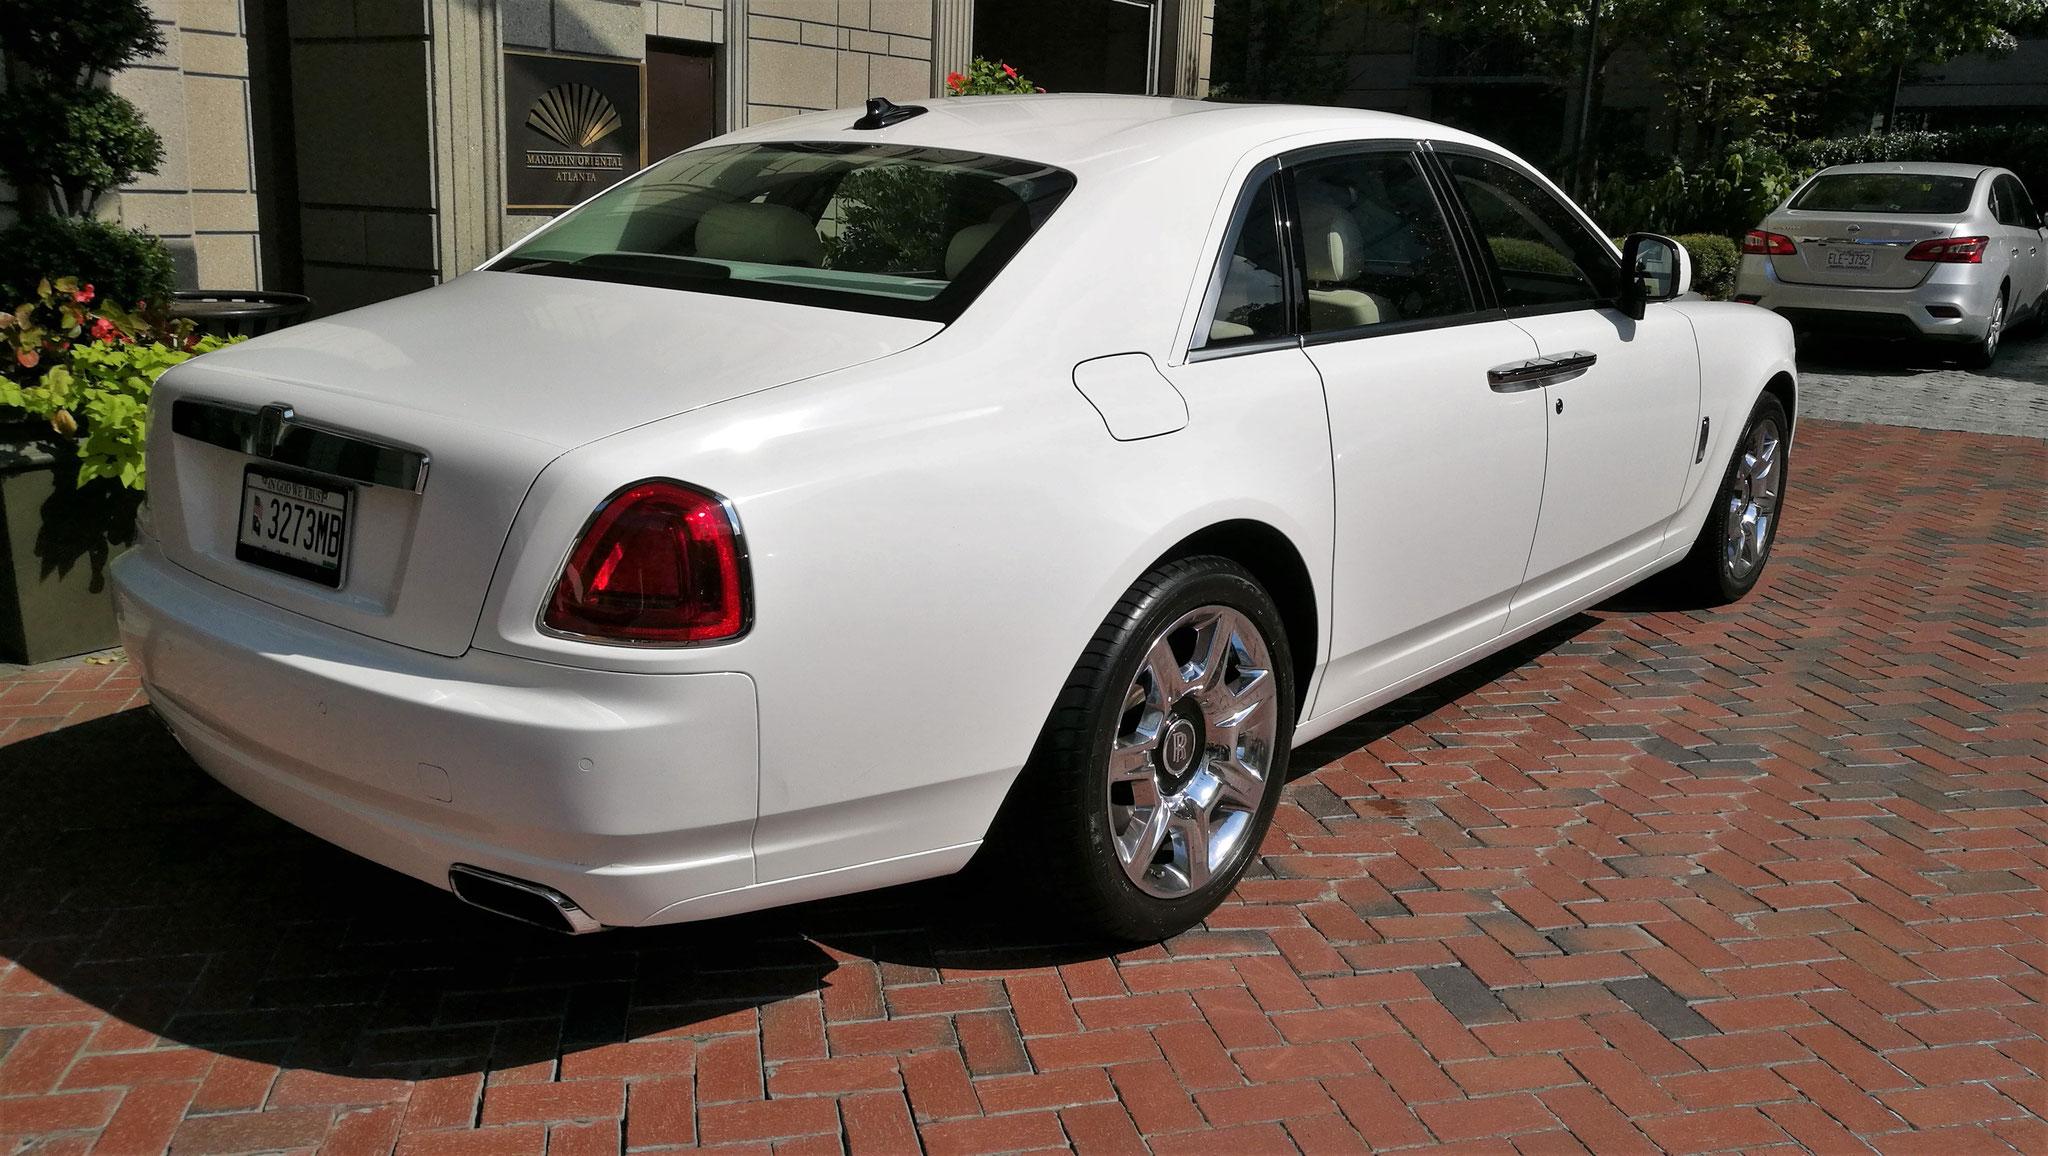 Rolls Royce Ghost Series II - 3273MB (USA)